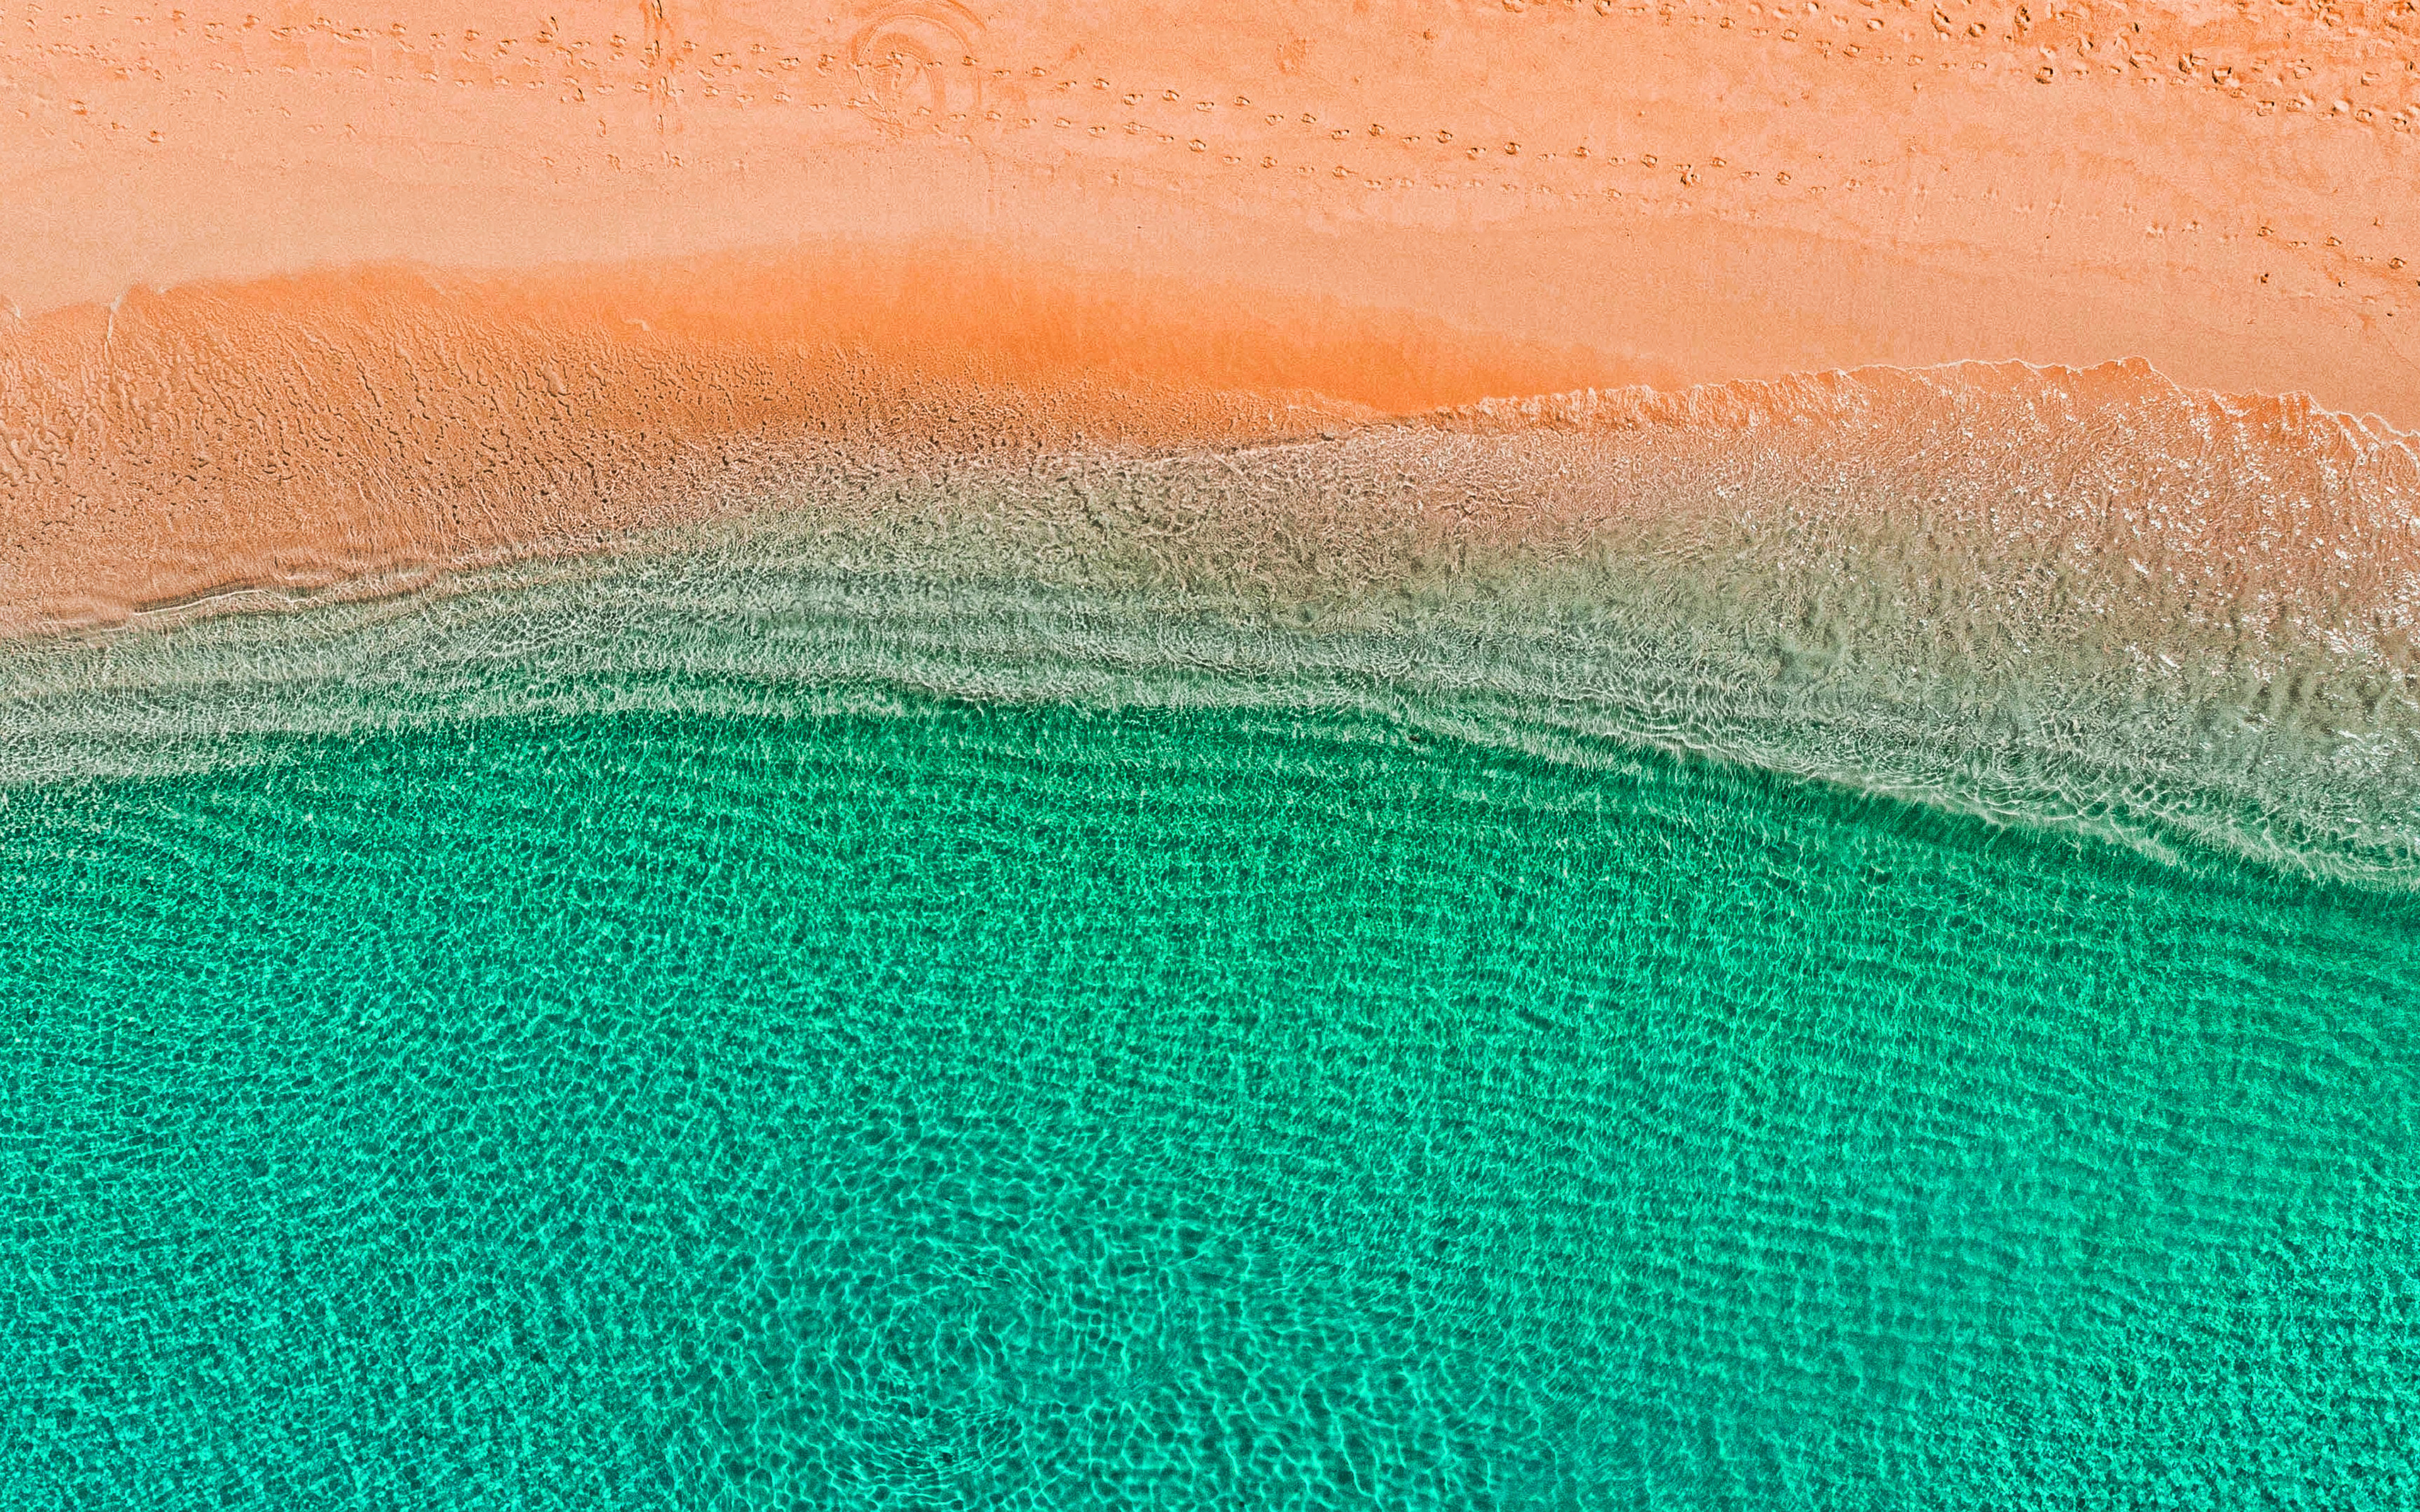 Download wallpapers Ocean aero view turquoise water coast 3840x2400